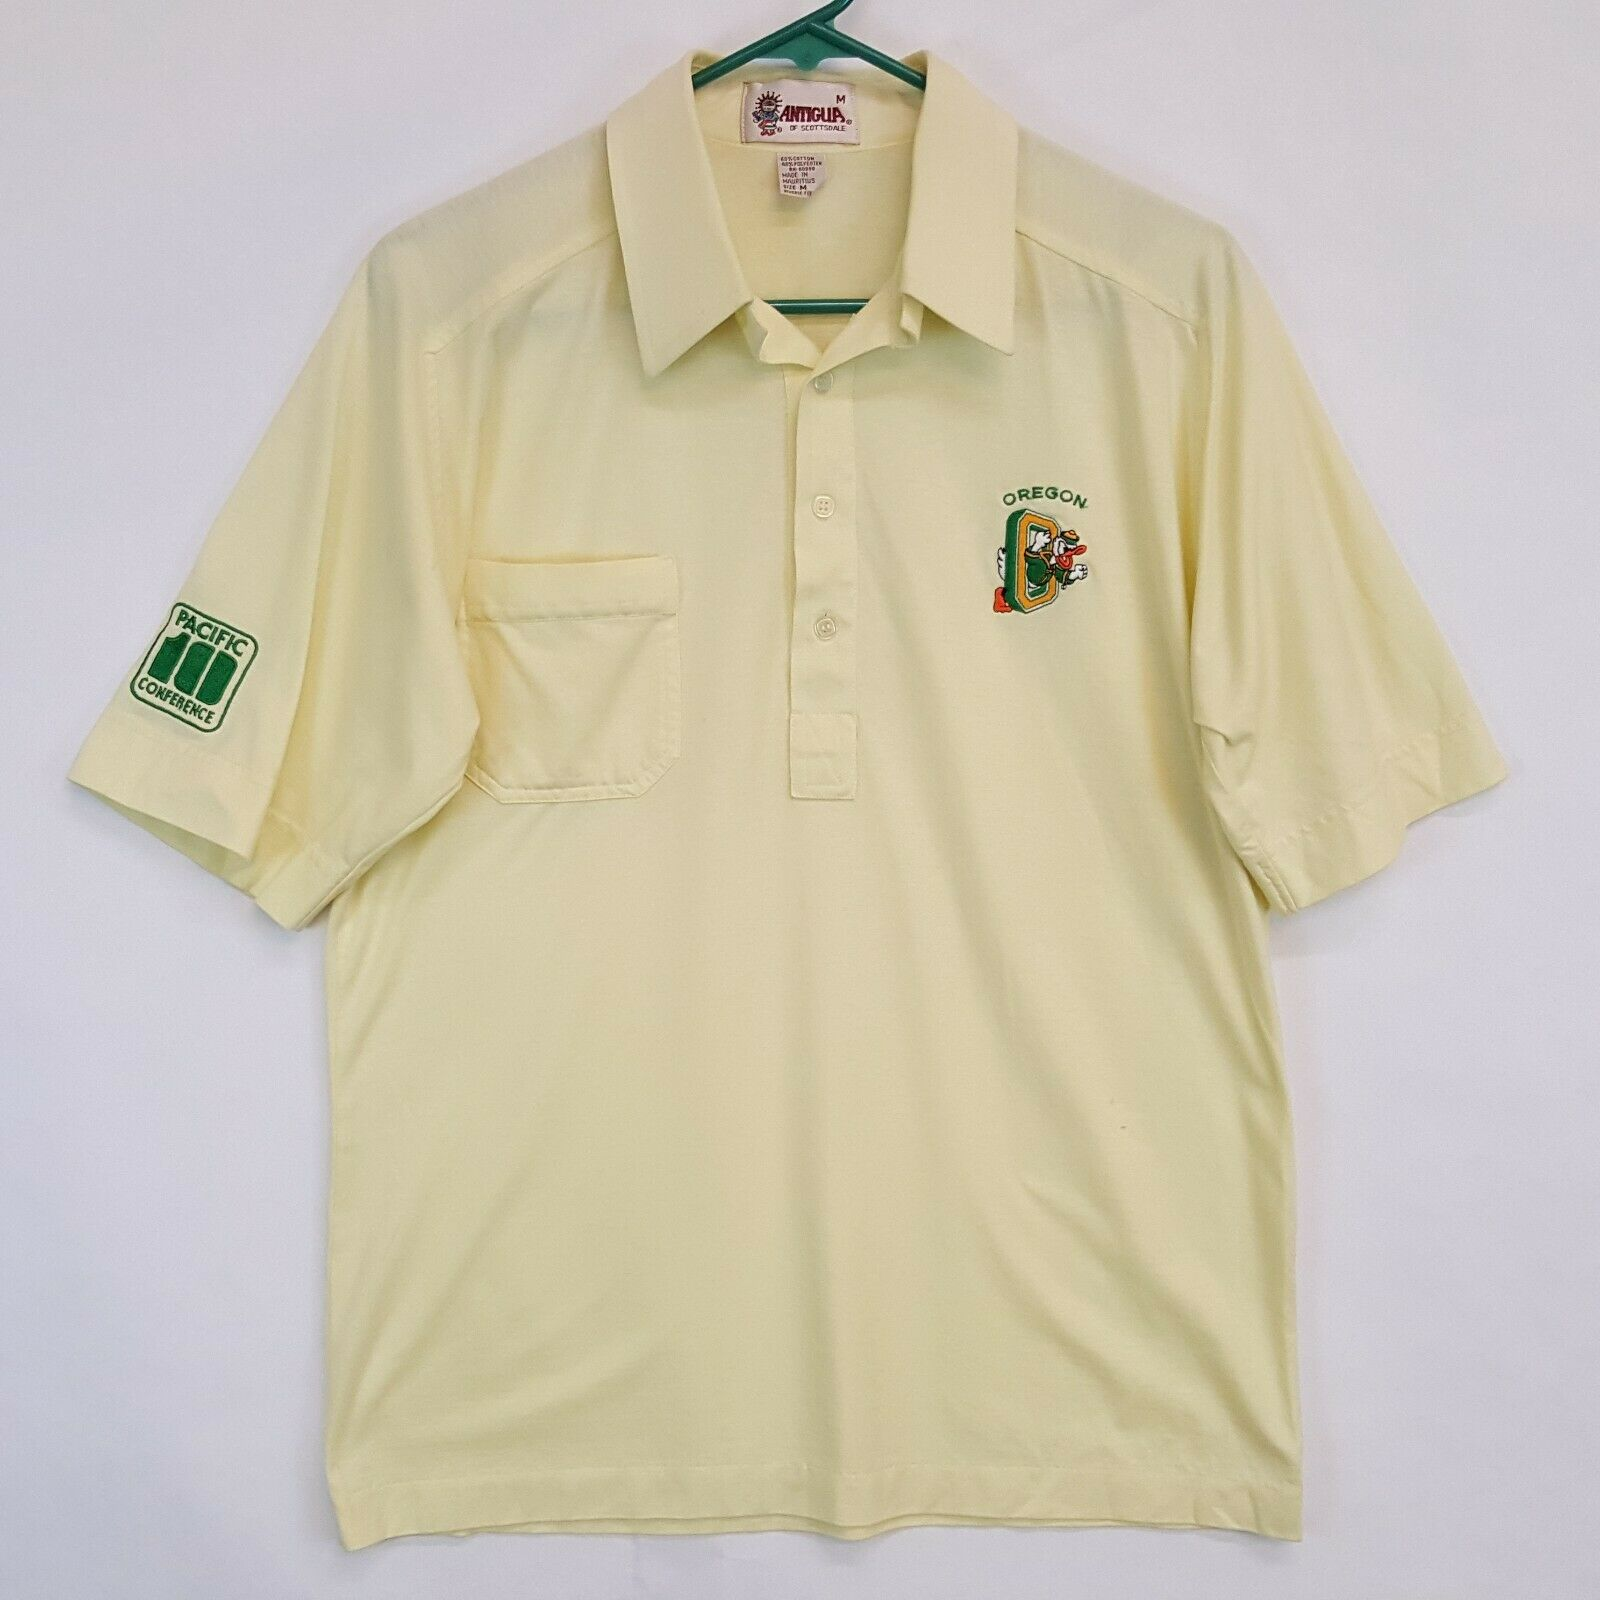 VTG 80s UO Oregon Ducks Antigua Pac 10 Polo Shirt… - image 1